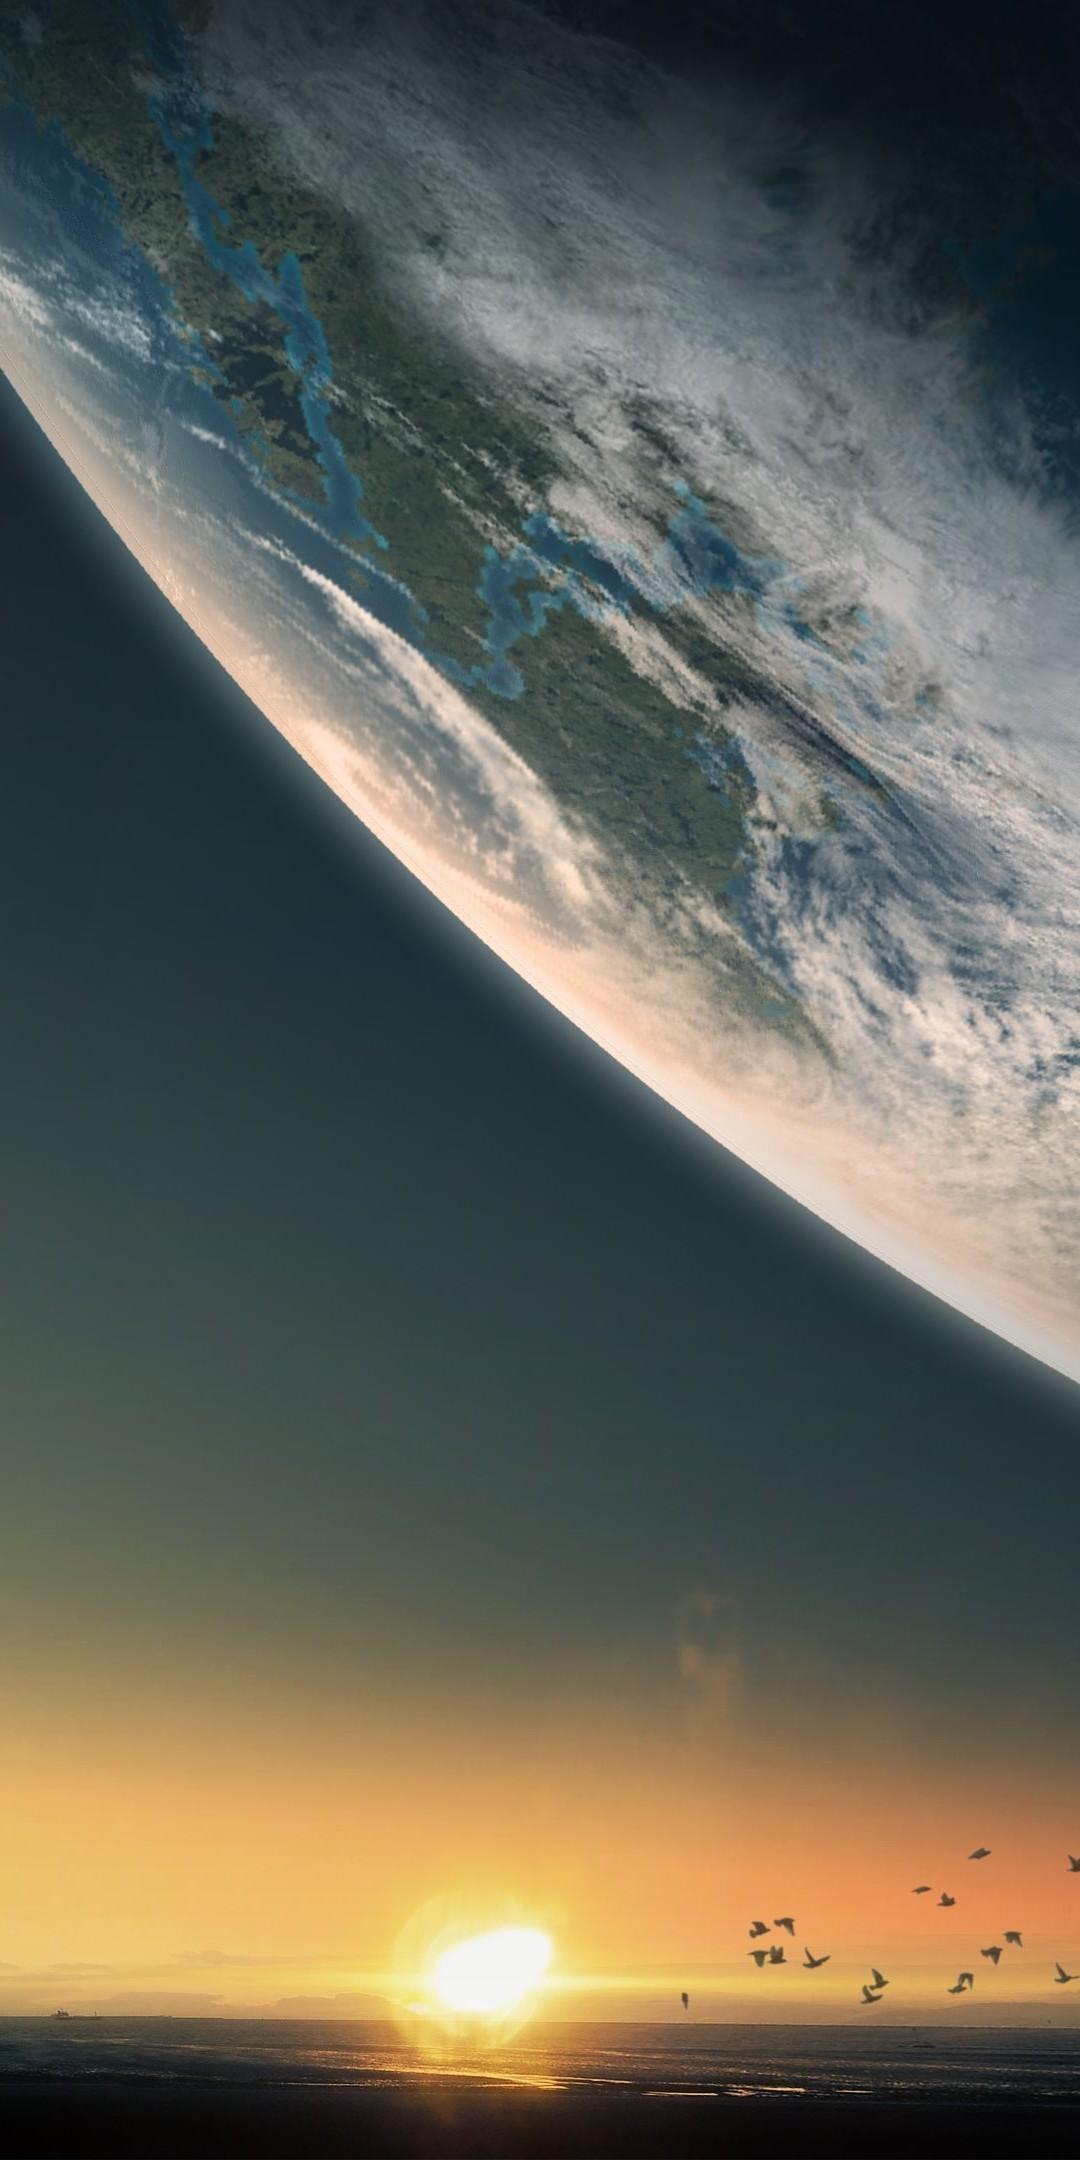 Planet Ultra HD Wallpaper [1080x2160]